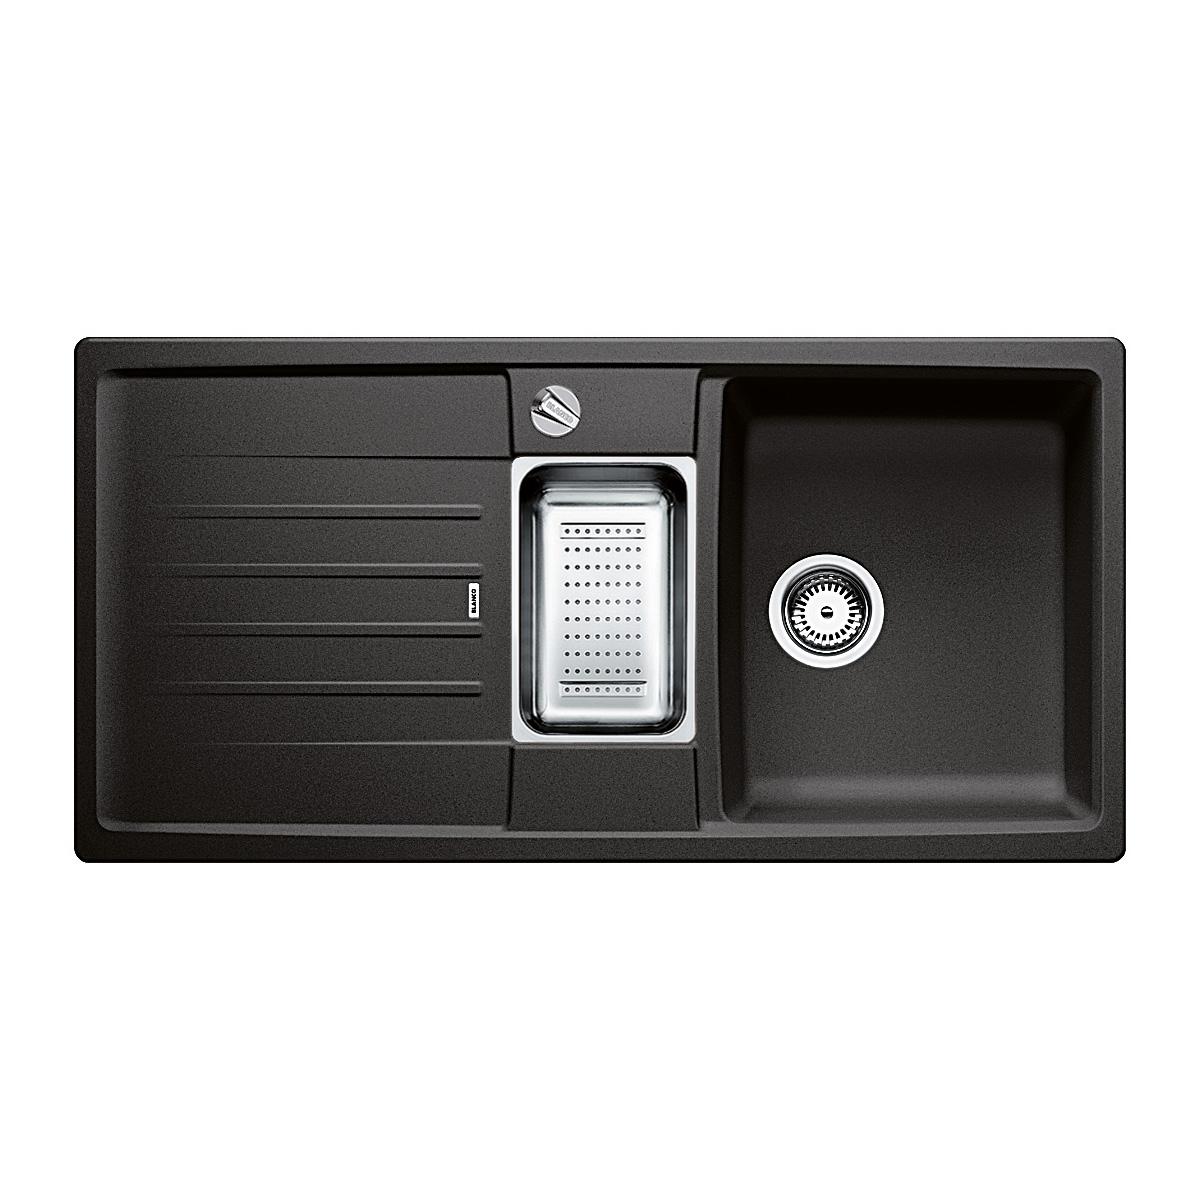 blanco lexa 6 s sp le b 100 t 50 cm becken silgranit. Black Bedroom Furniture Sets. Home Design Ideas